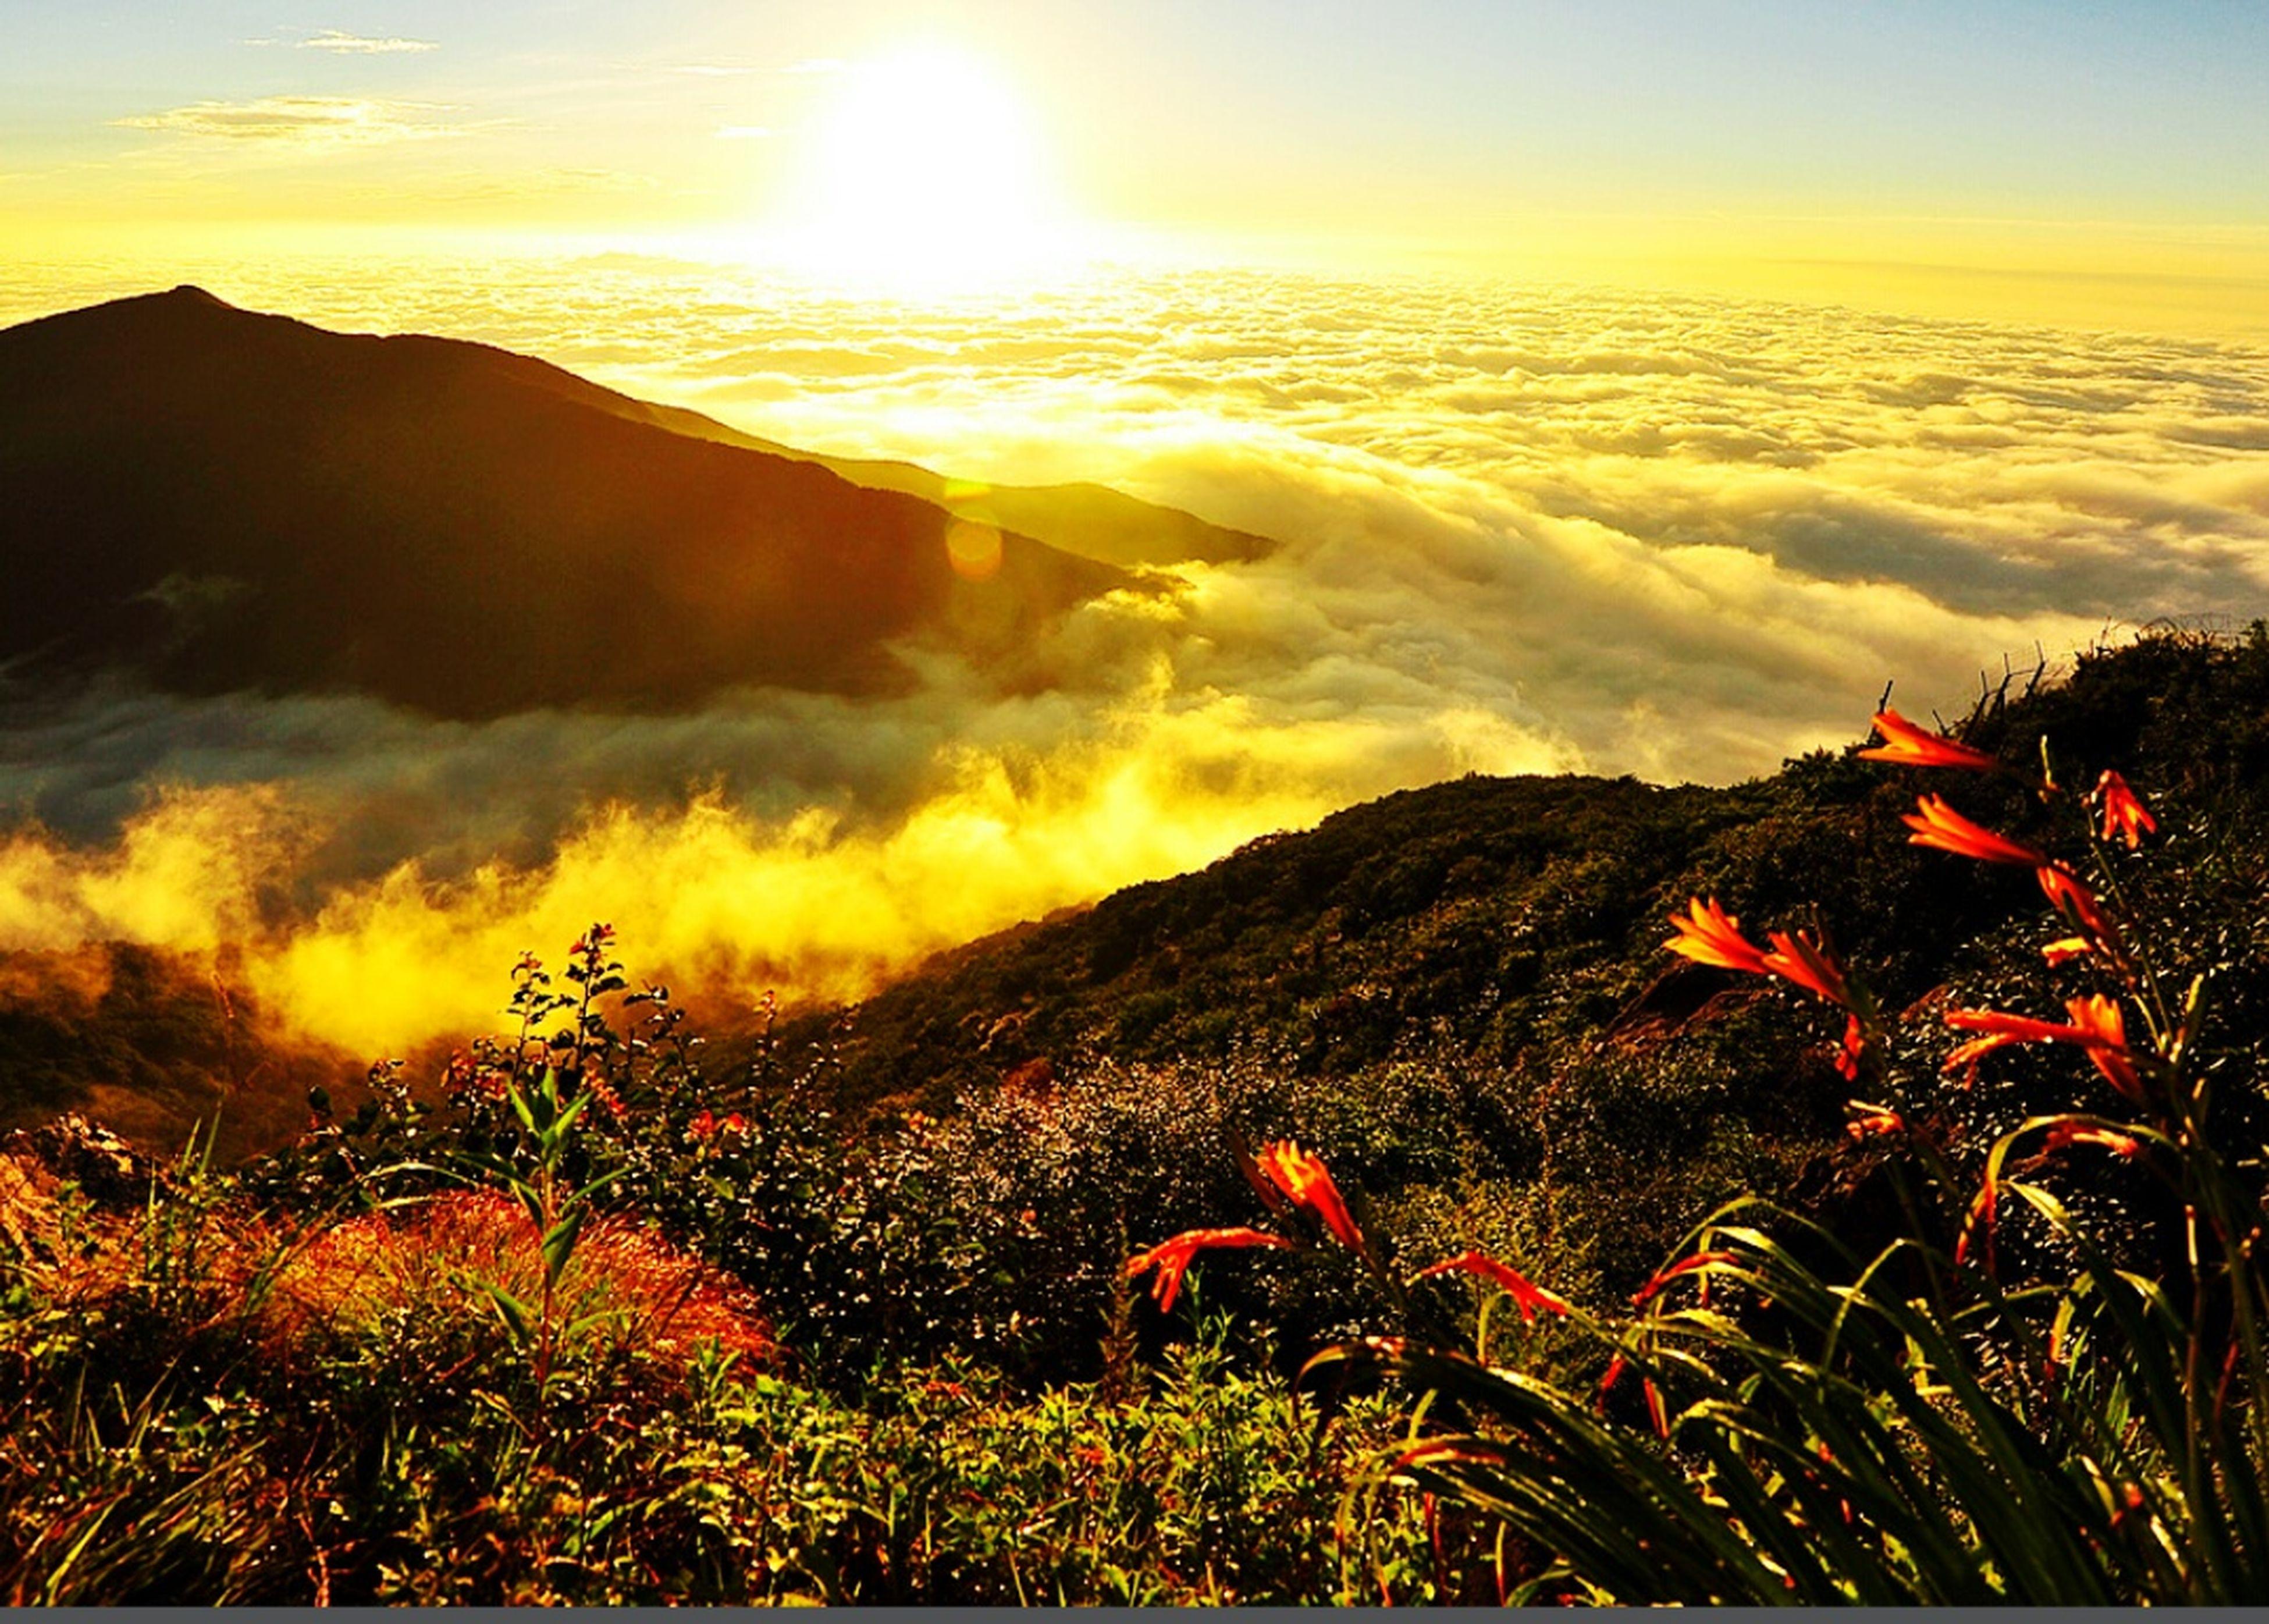 sunset, mountain, scenics, tranquil scene, beauty in nature, sky, tranquility, nature, landscape, orange color, sun, idyllic, mountain range, plant, sunlight, cloud - sky, non-urban scene, sunbeam, outdoors, growth